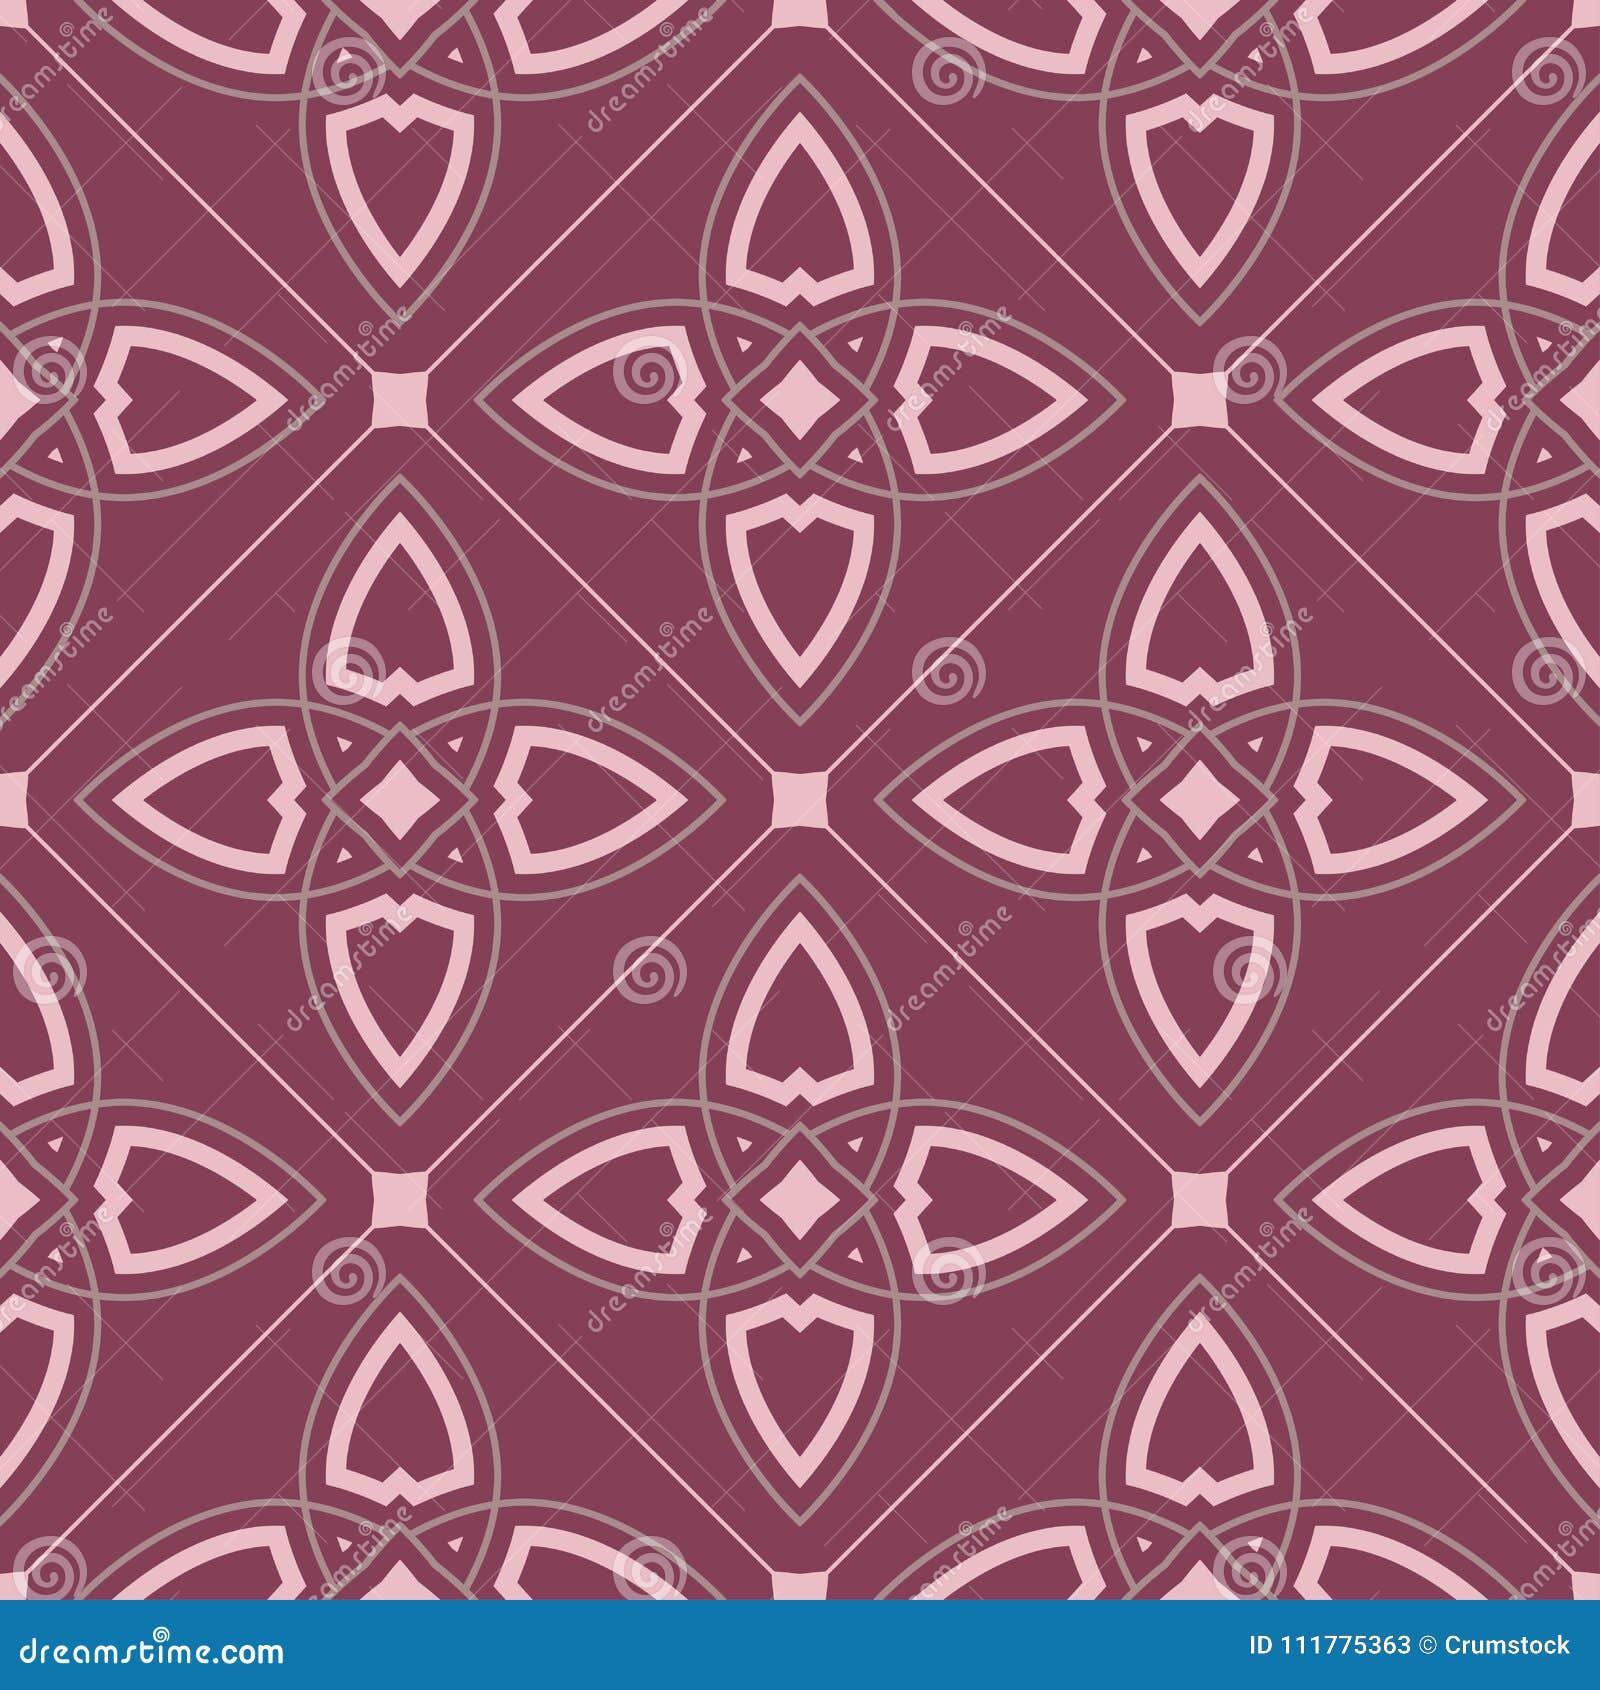 Geometric seamless pattern. Purple red background